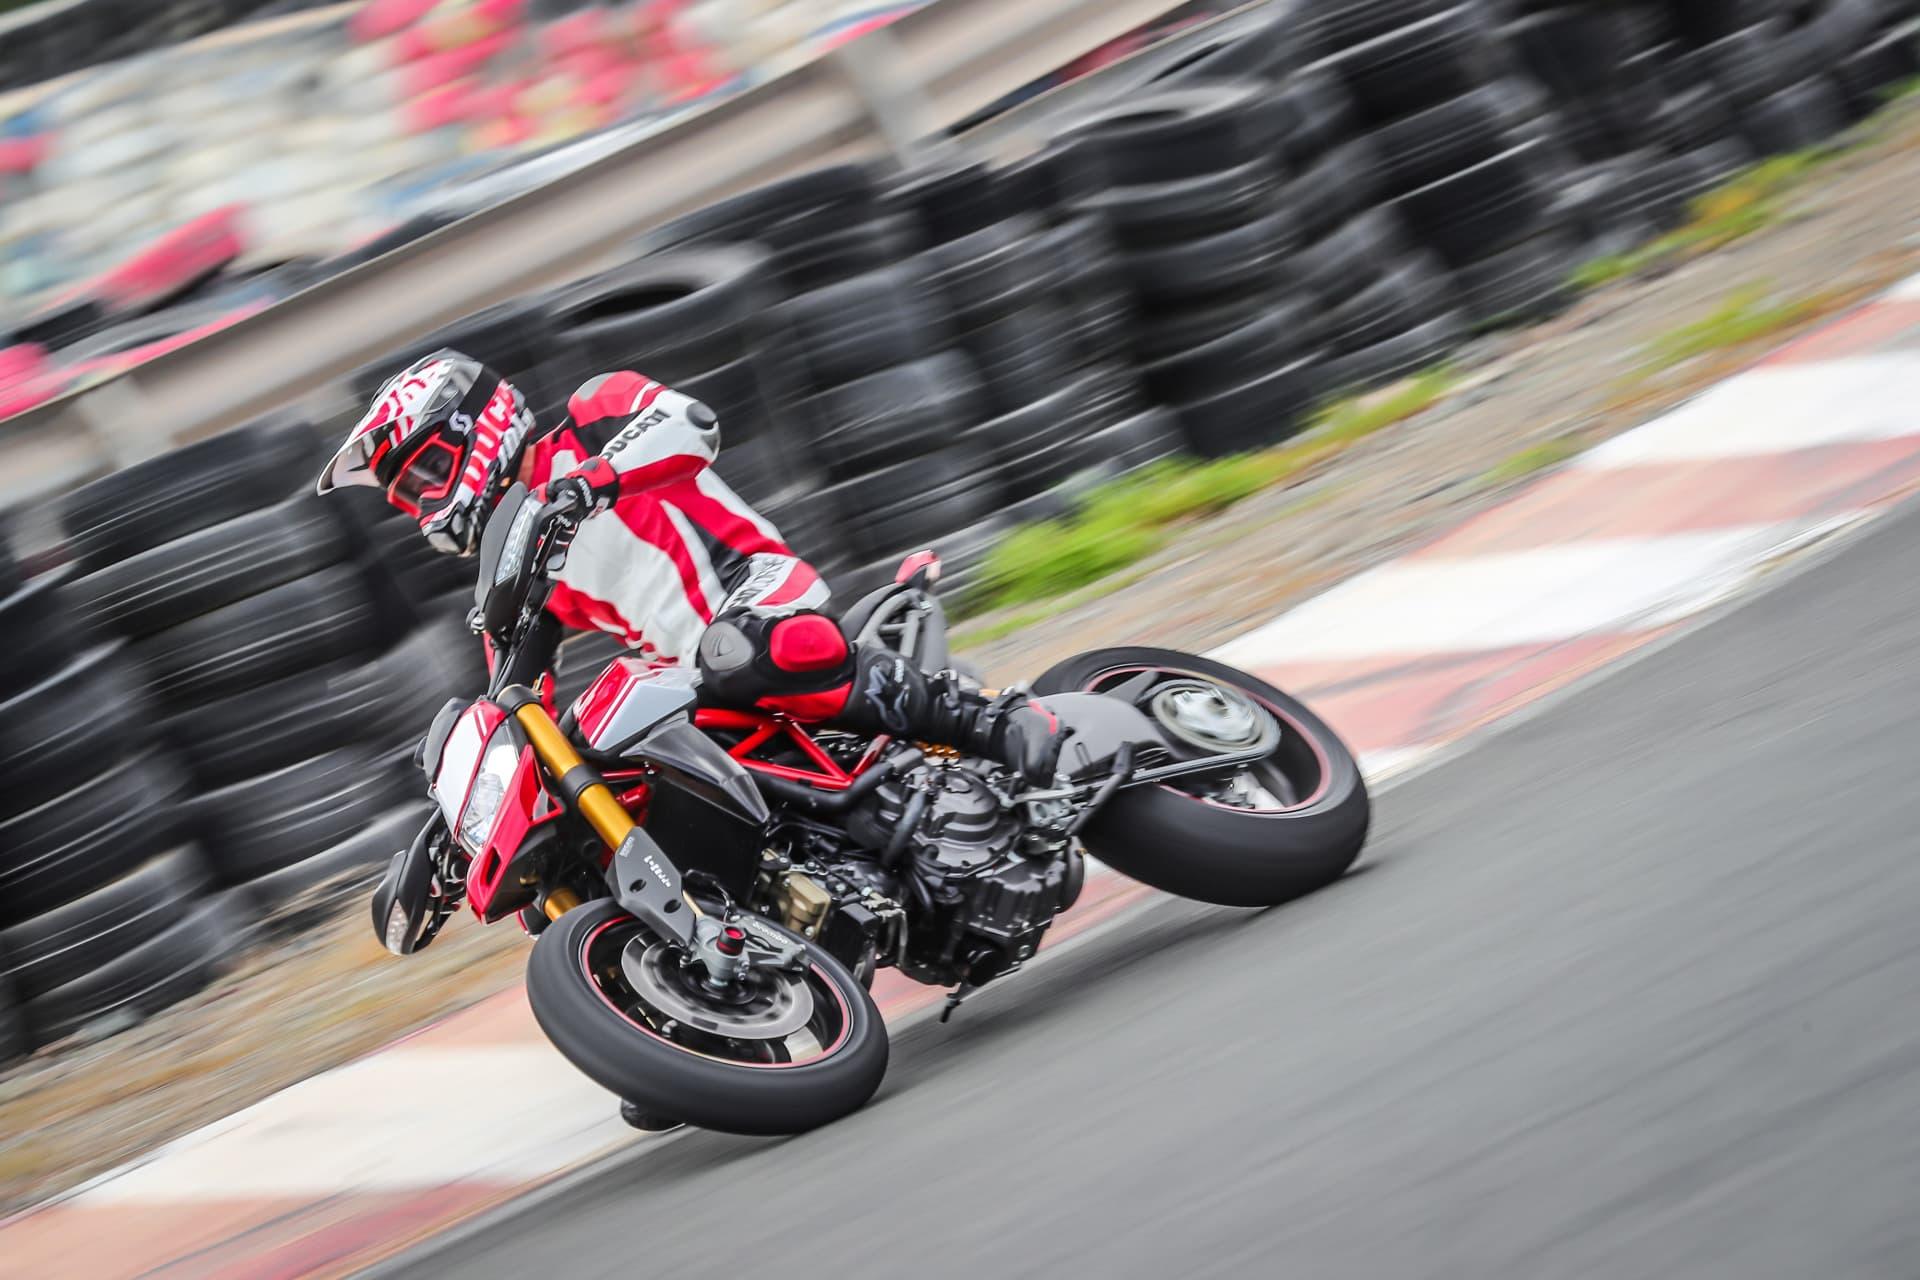 Ducati Hypermotard 950 Sp Performance 13 Uc70343 Mid